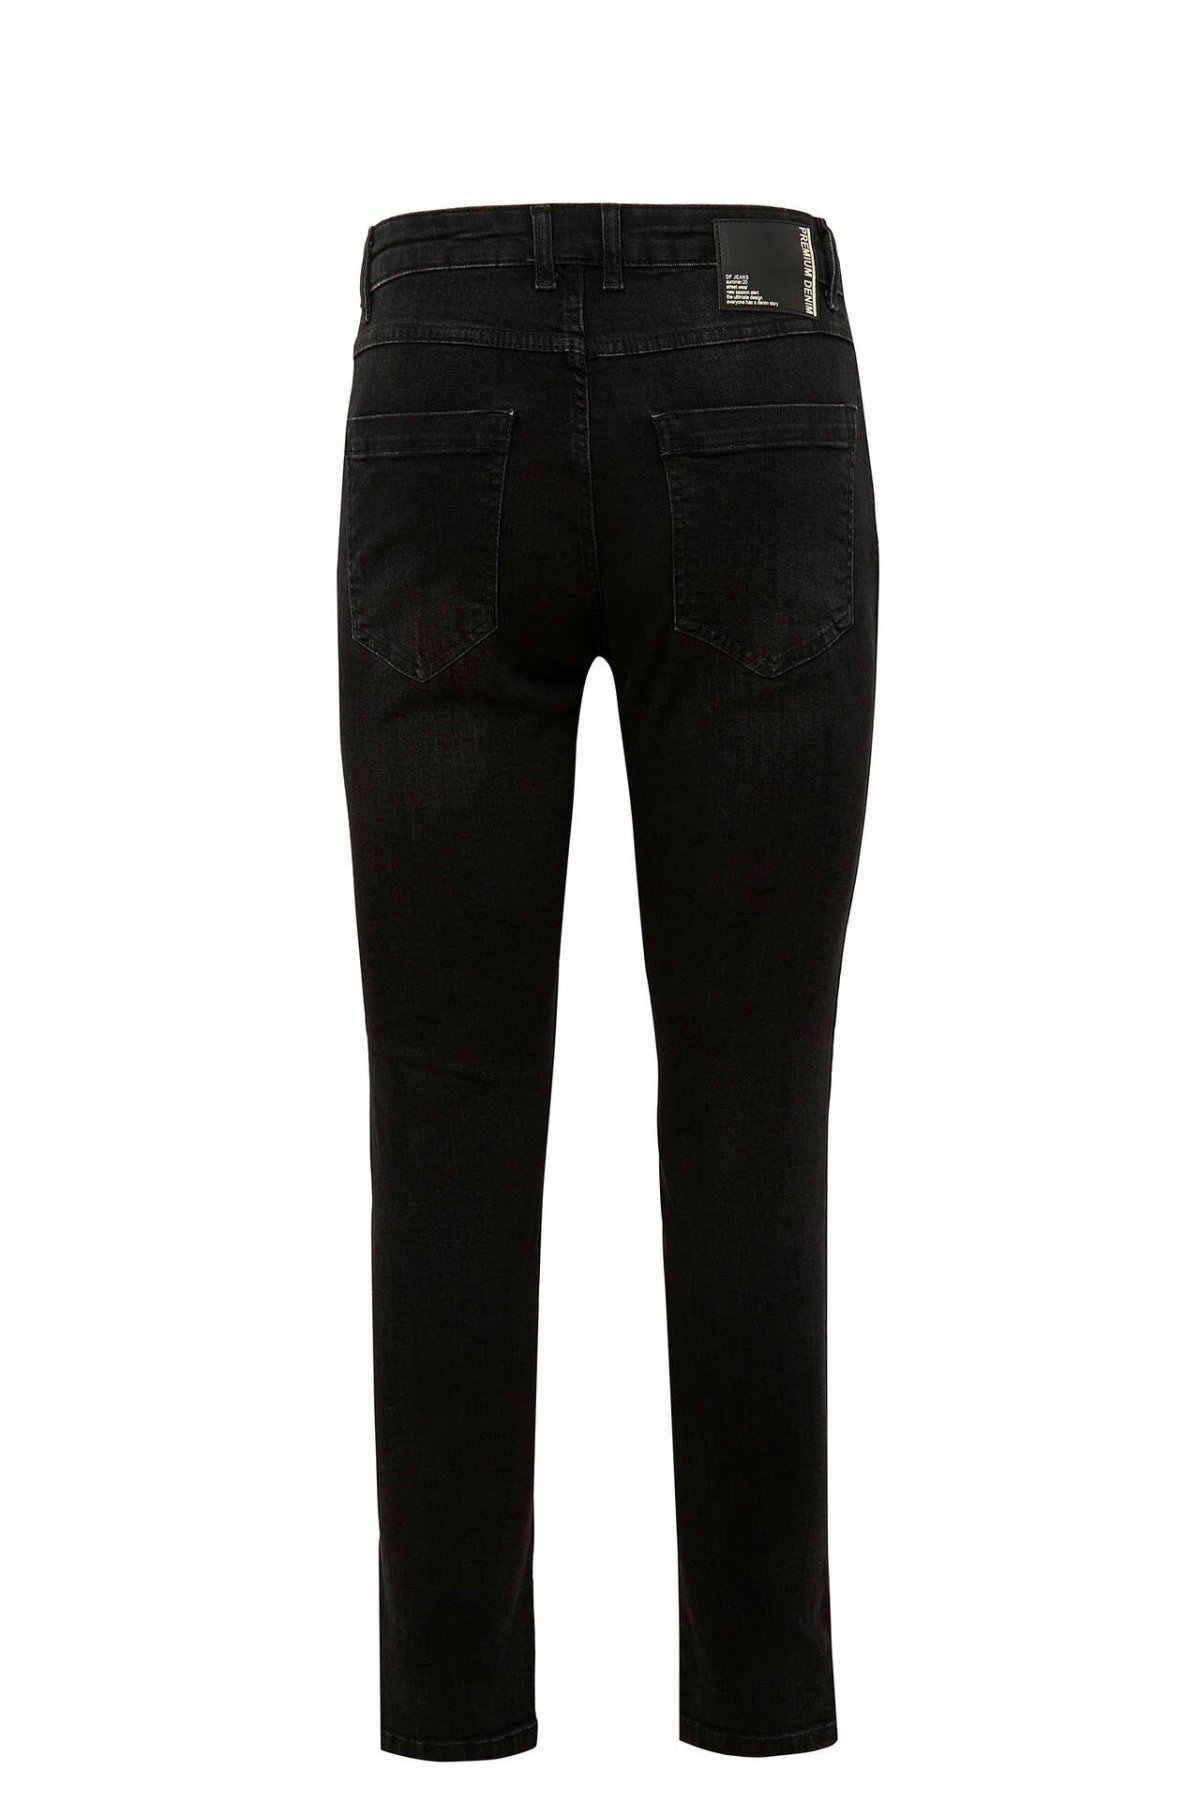 Defacto Man Casual Zwart Denim Jeans Mannen Lente Fit Lichaam Jeans Mannen Denim Bottoms Mannen Basic kleur Trousers-N7874AZ20SP